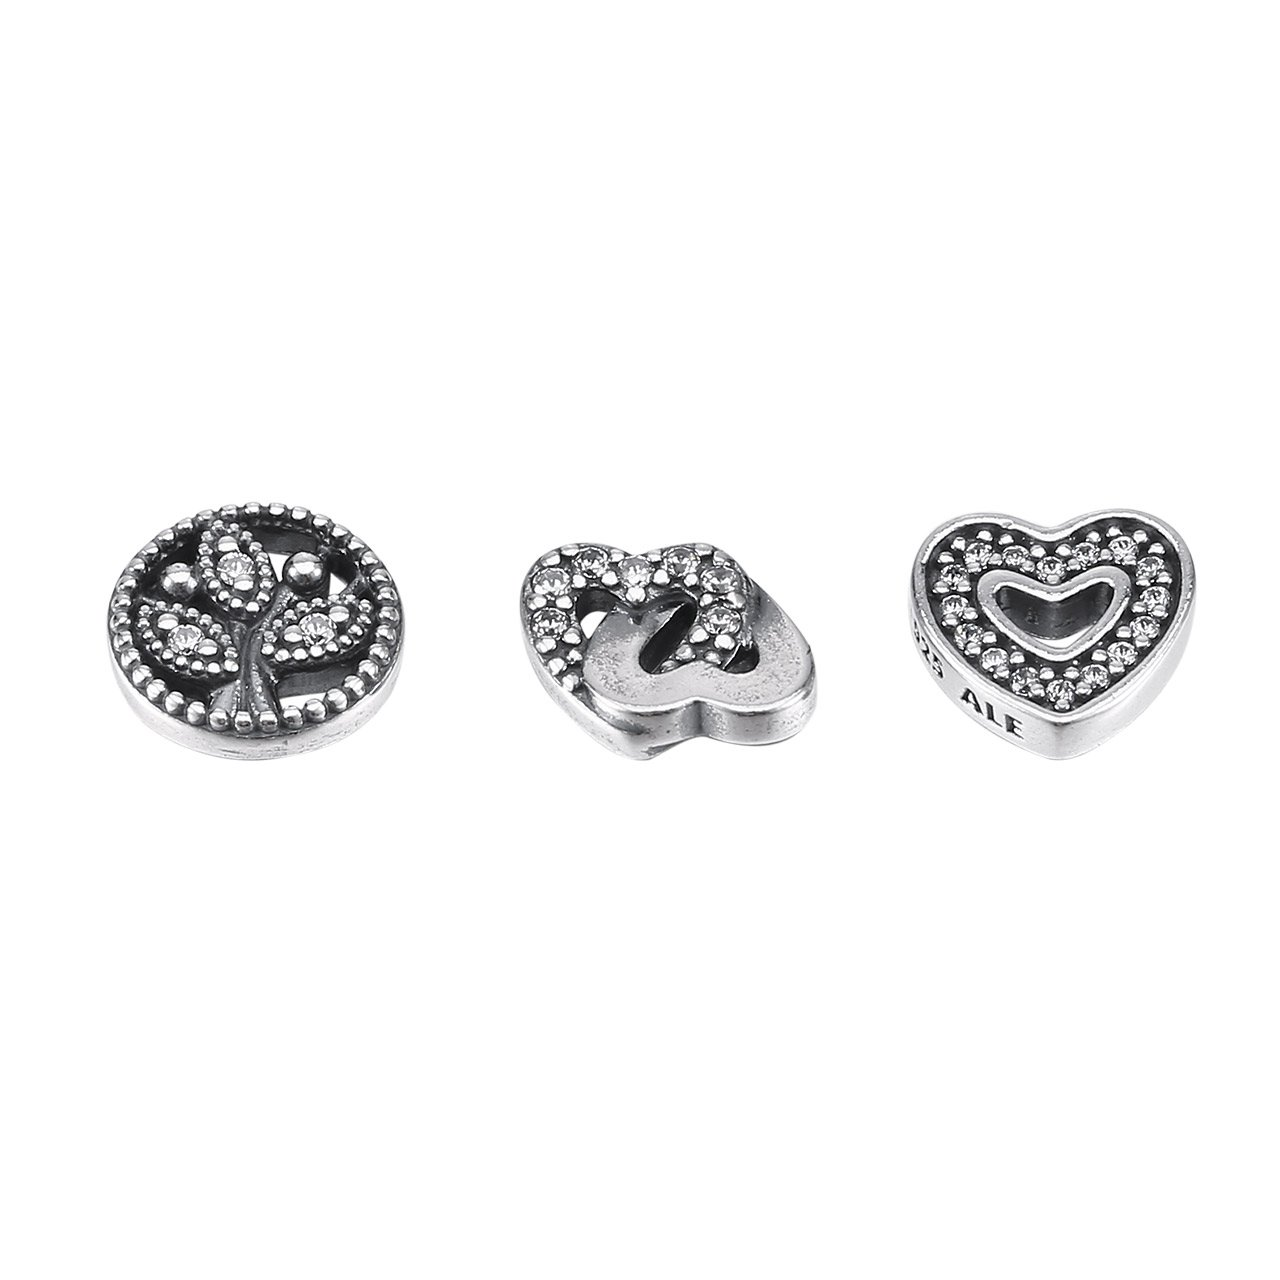 0d4a2a582 Amazon.com: Pandora Women's Love and Family Petites Locket Charm -  792022CZ: Jewelry